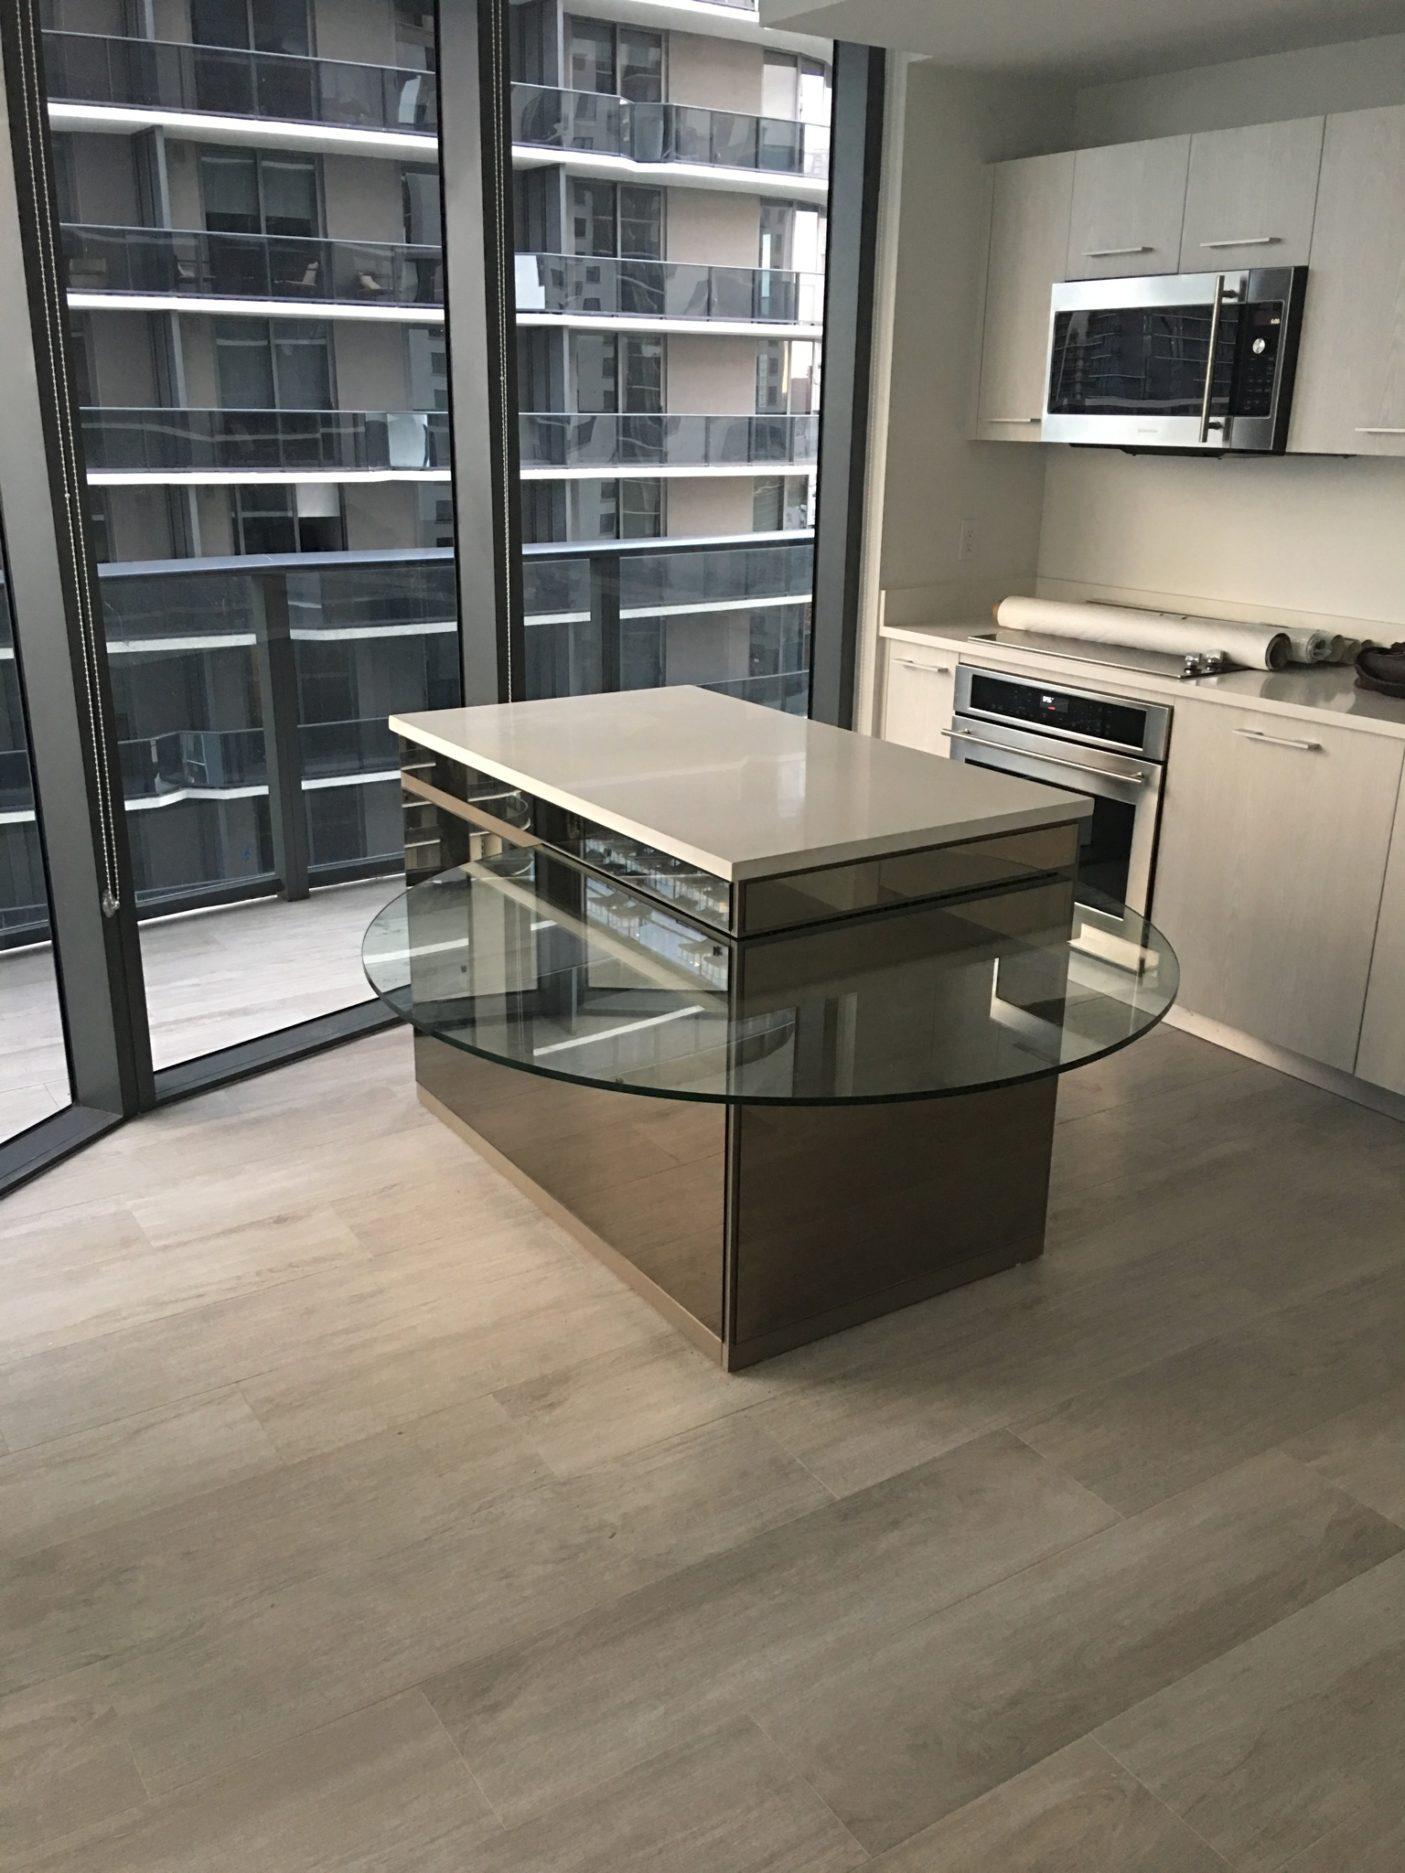 Kitchens-187.jpg